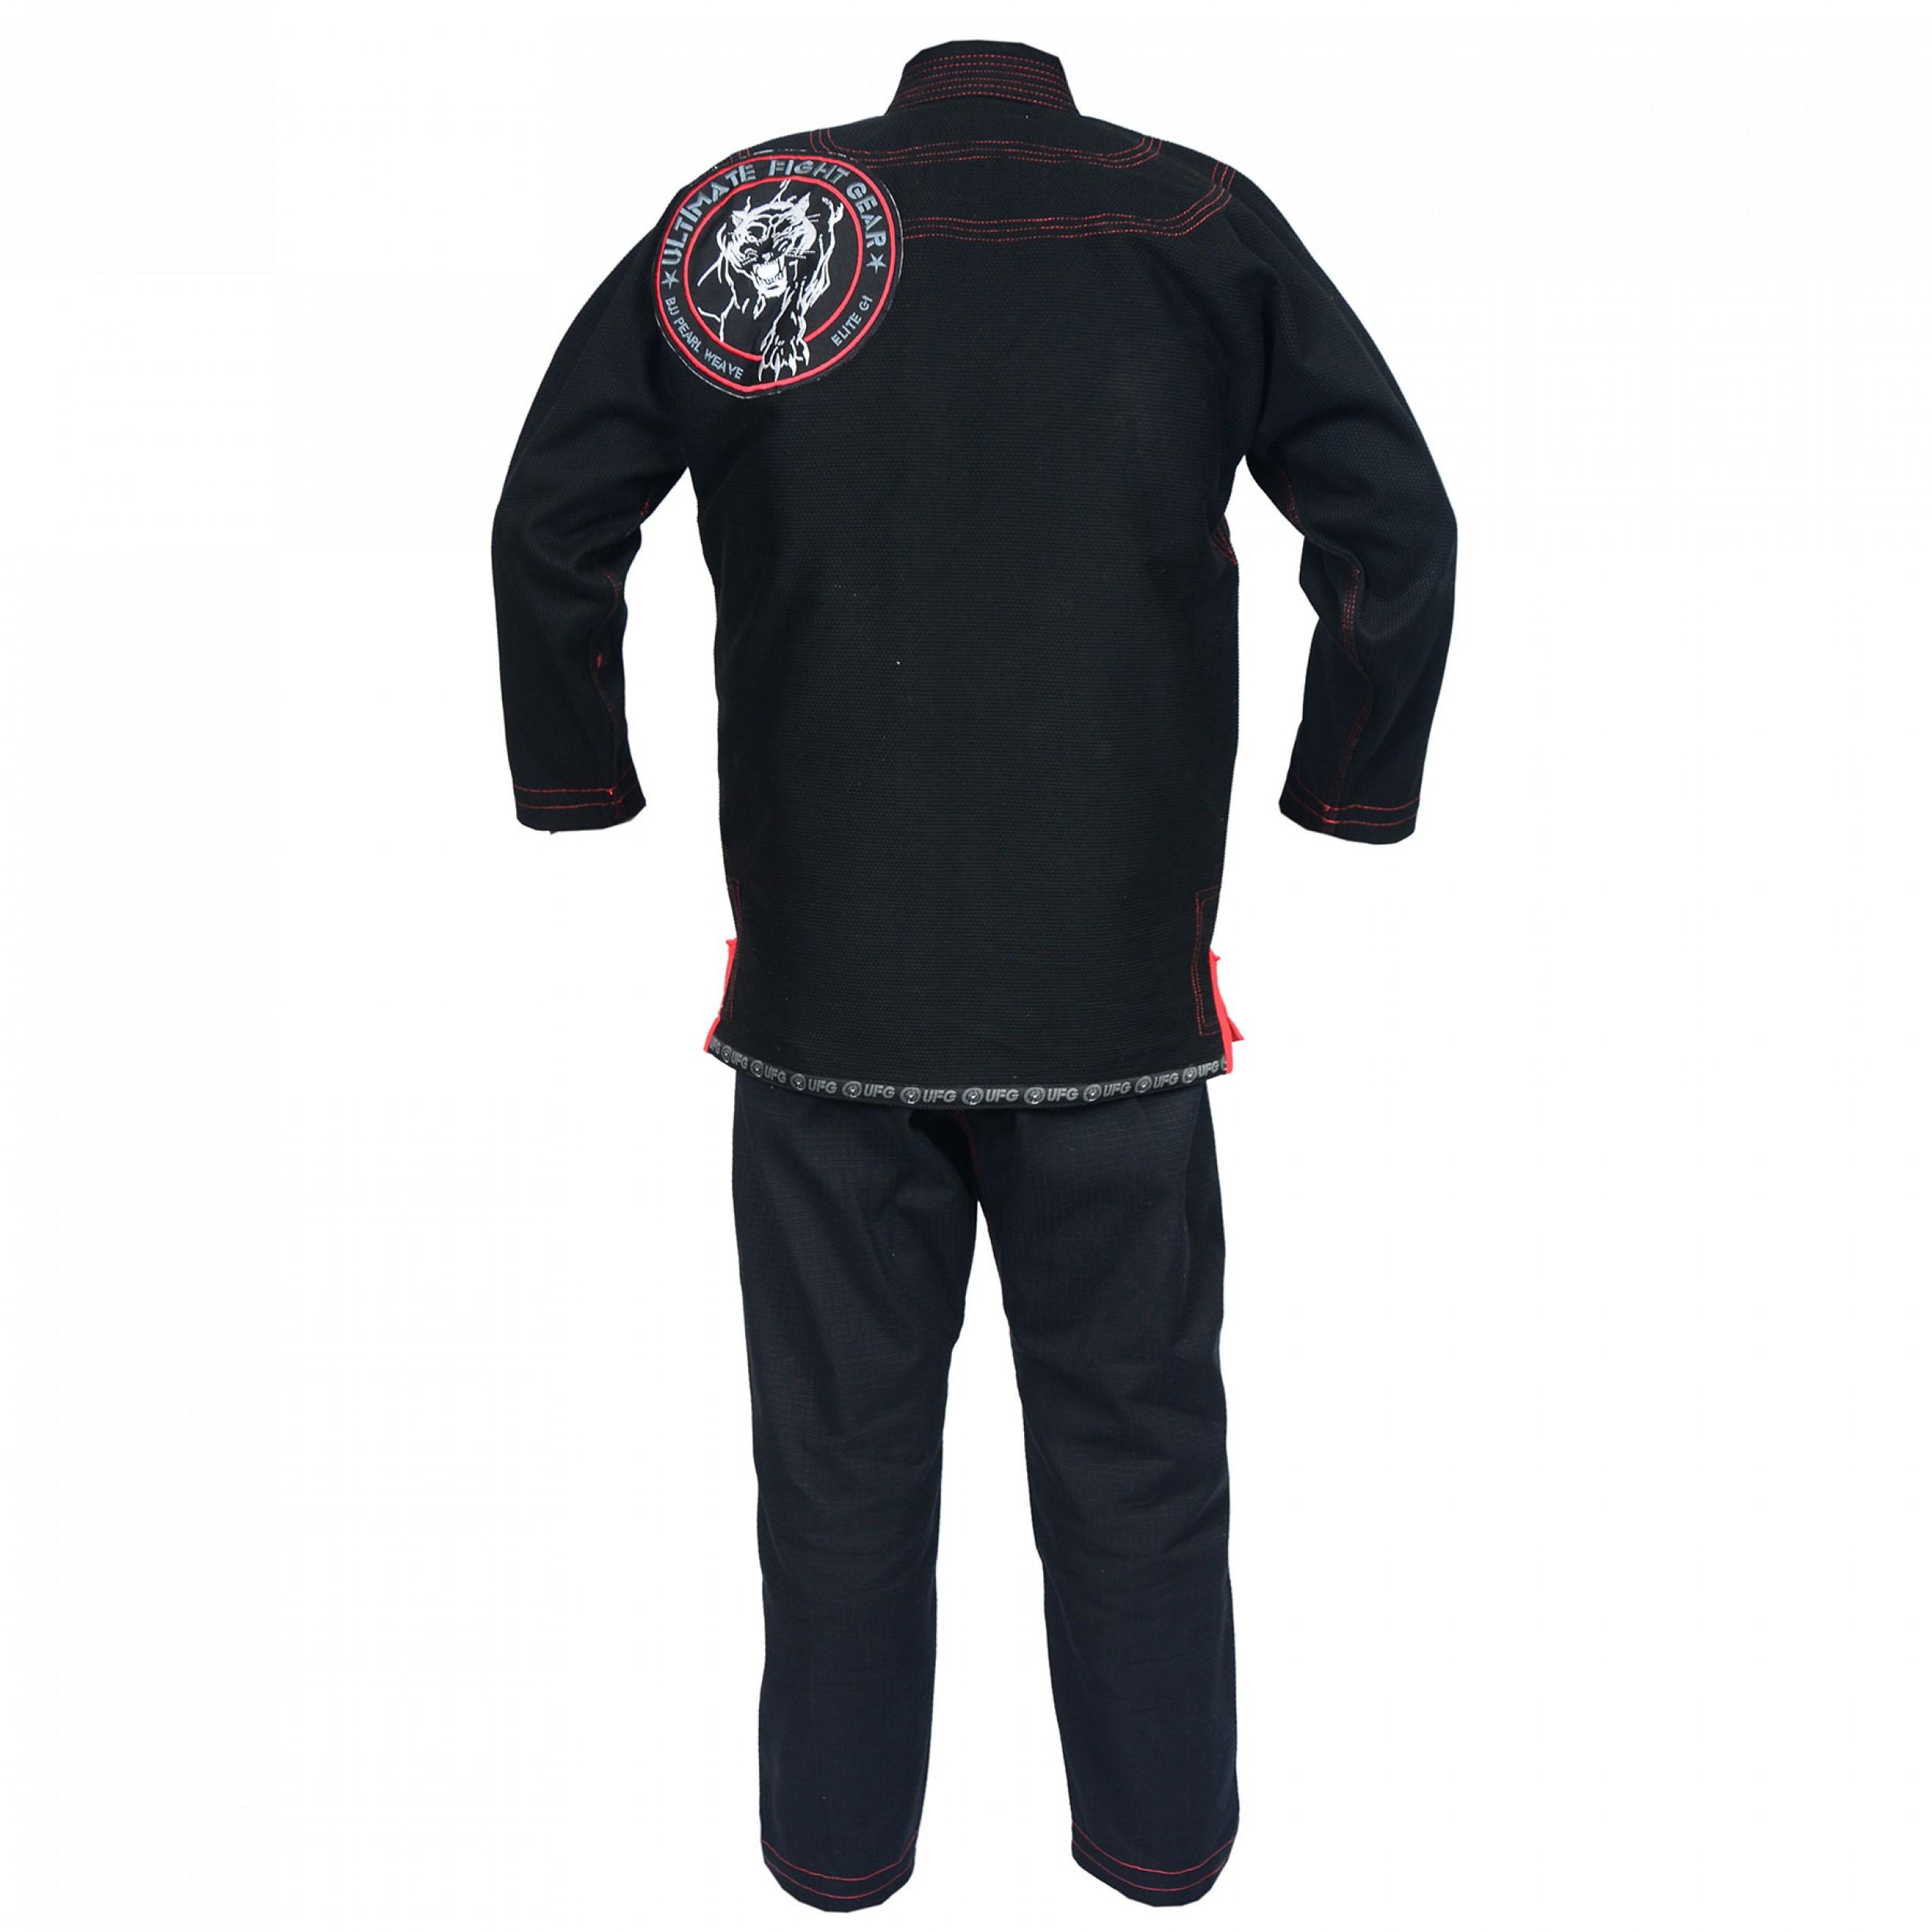 Elite Gi Black With Embroidery